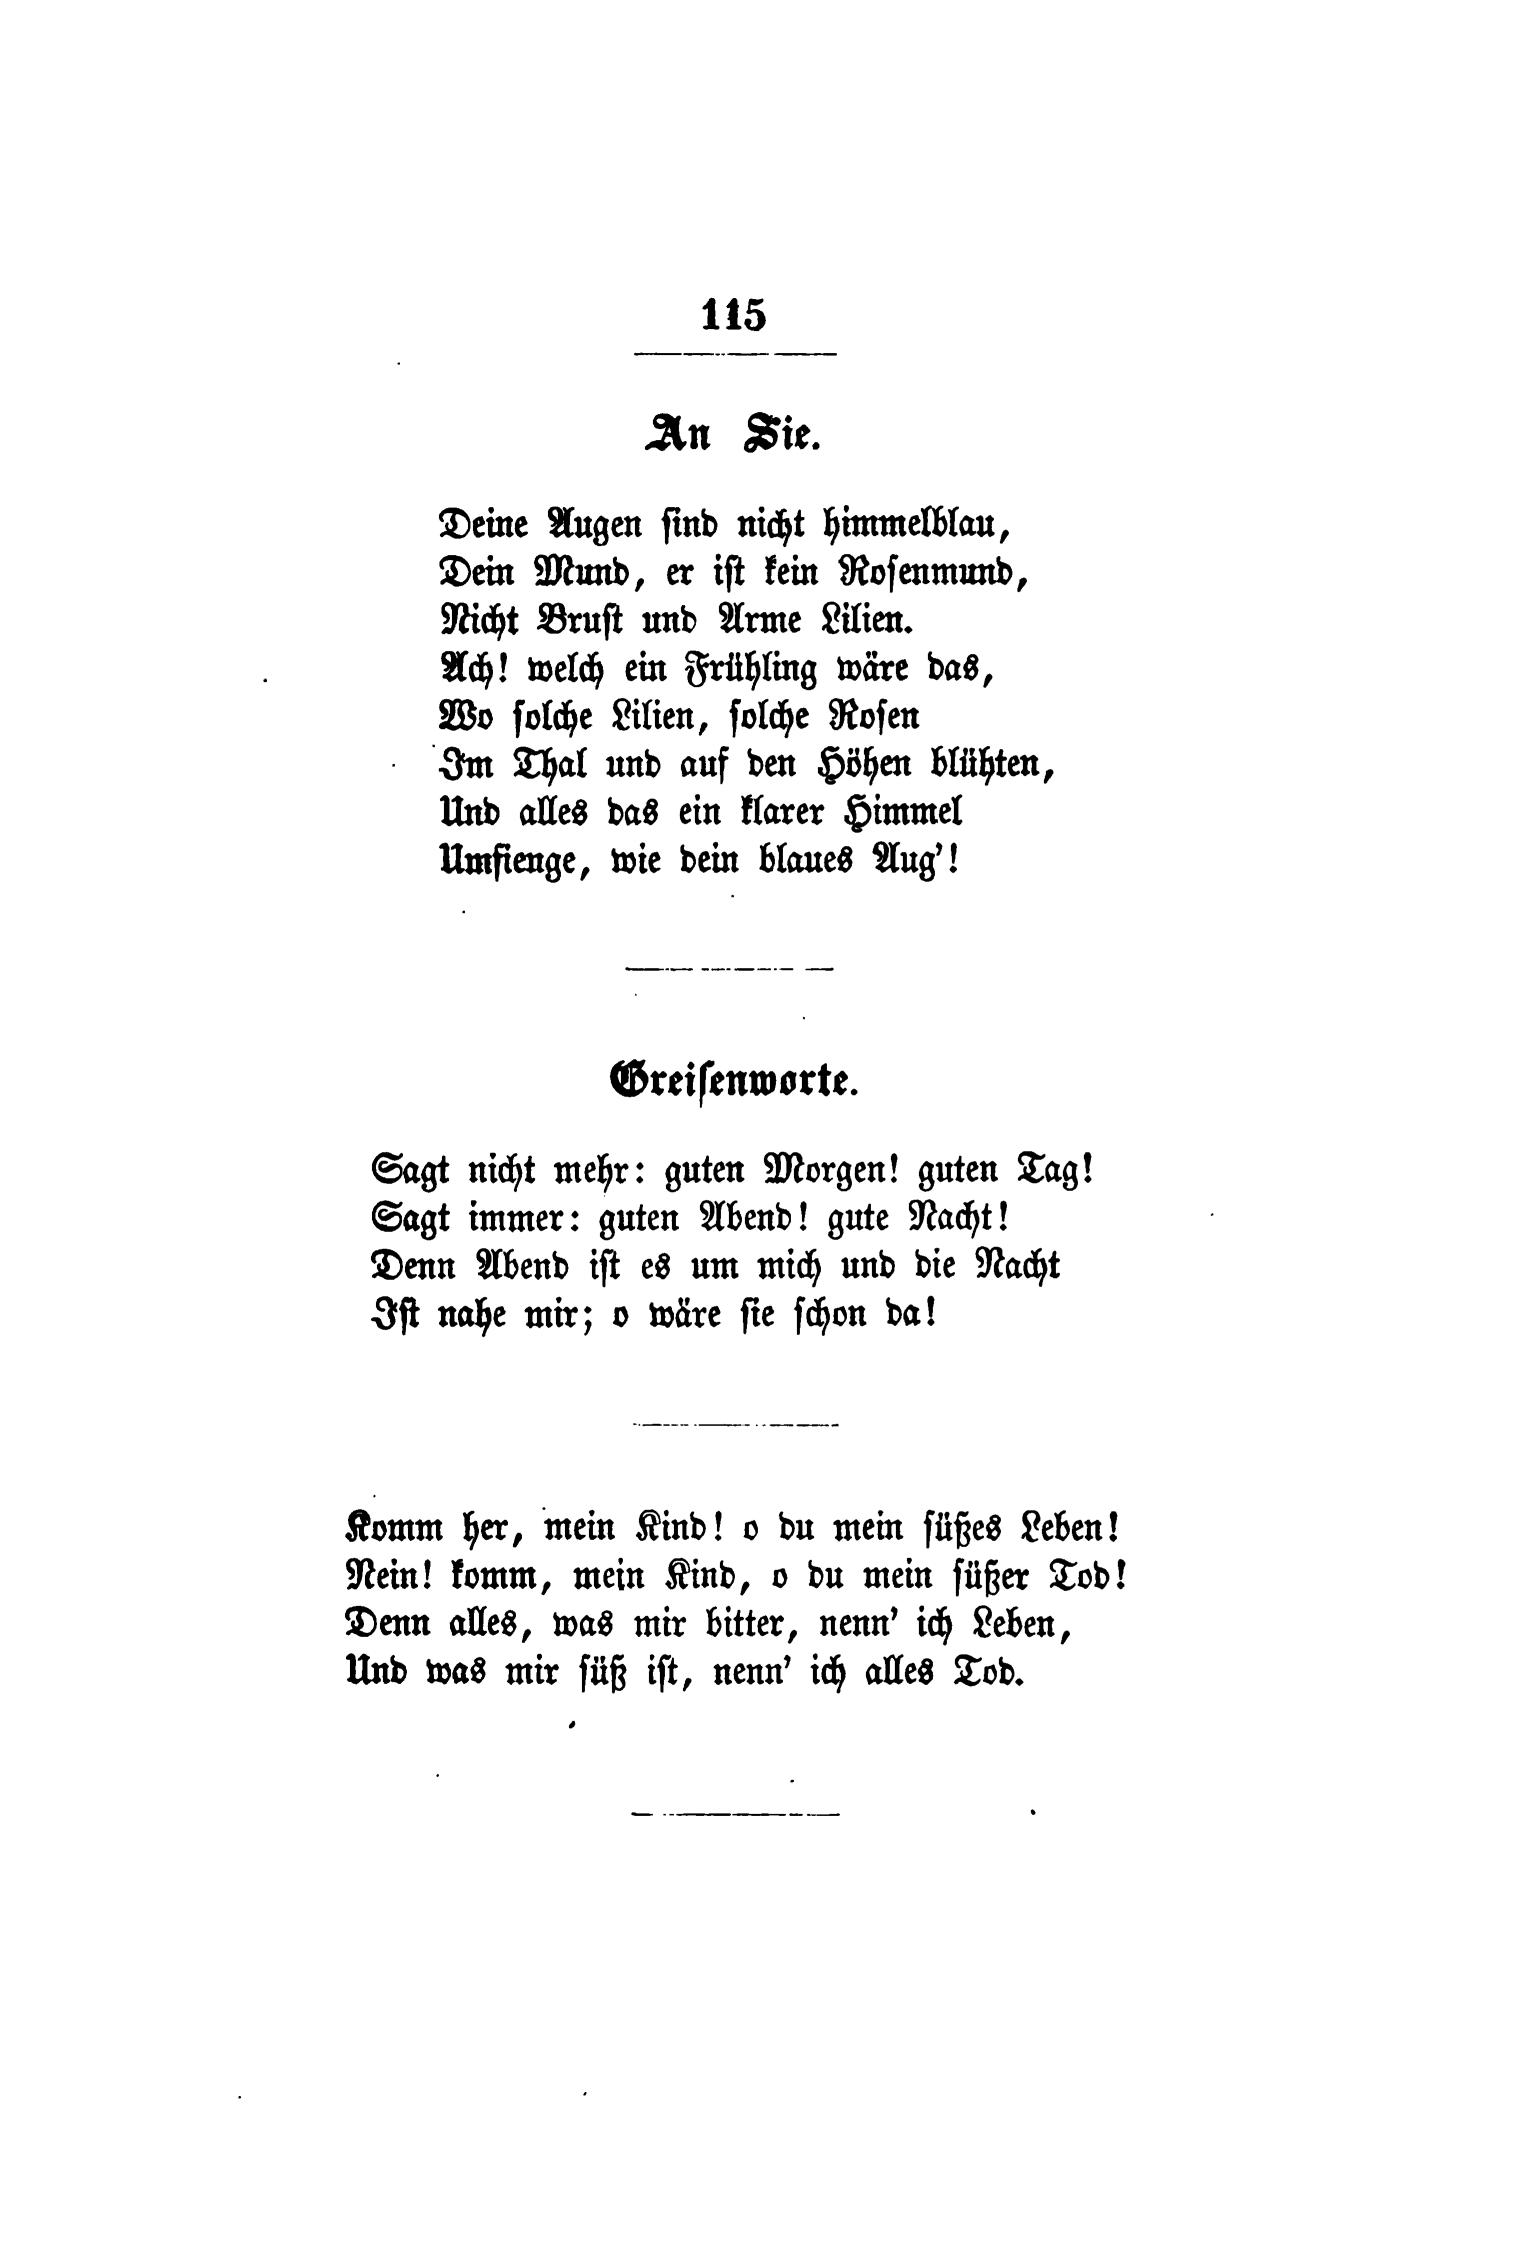 Filede Gedichte Uhland 137jpg Wikimedia Commons